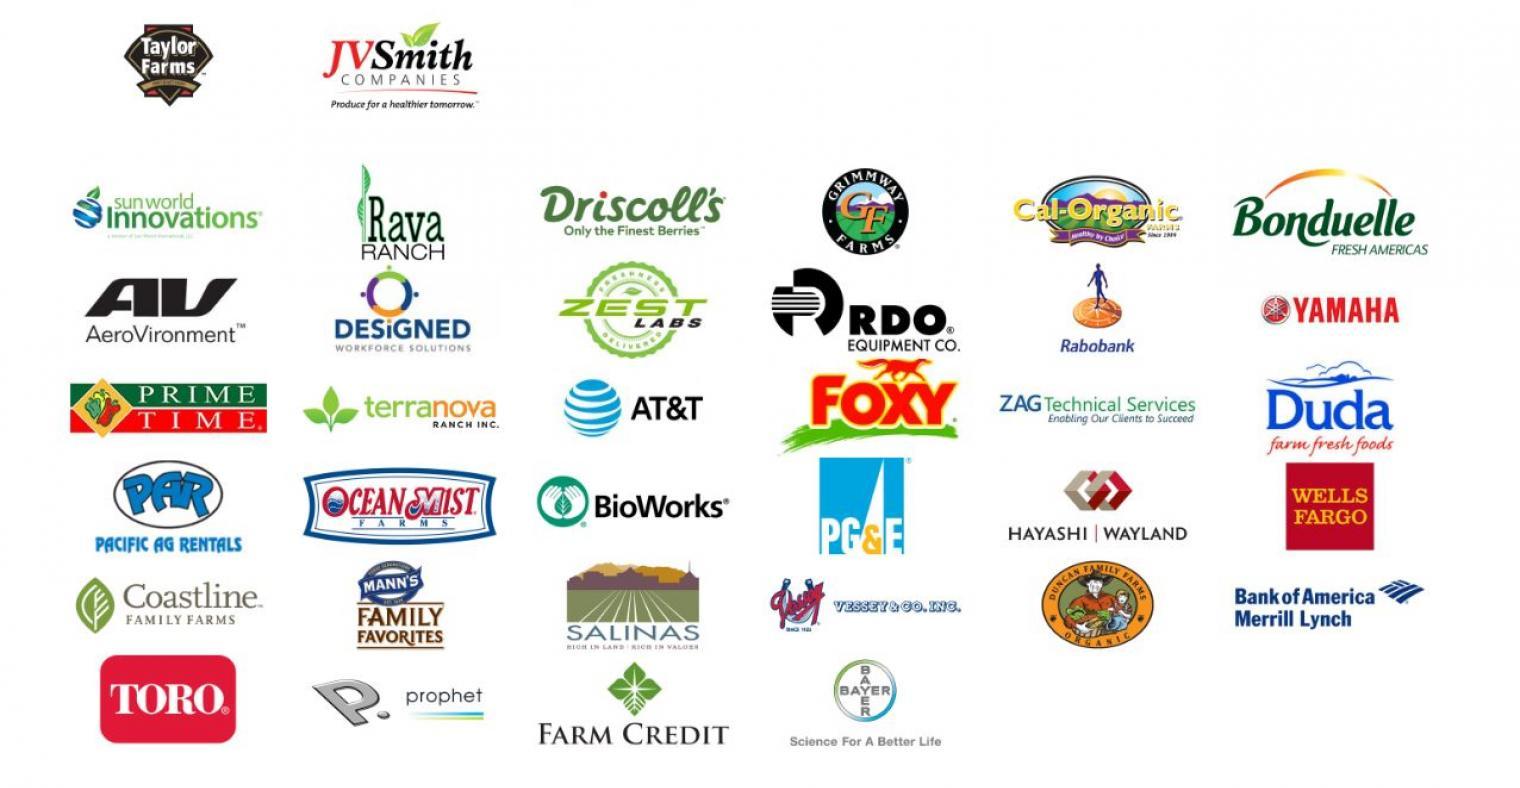 WGCIT Sponsors